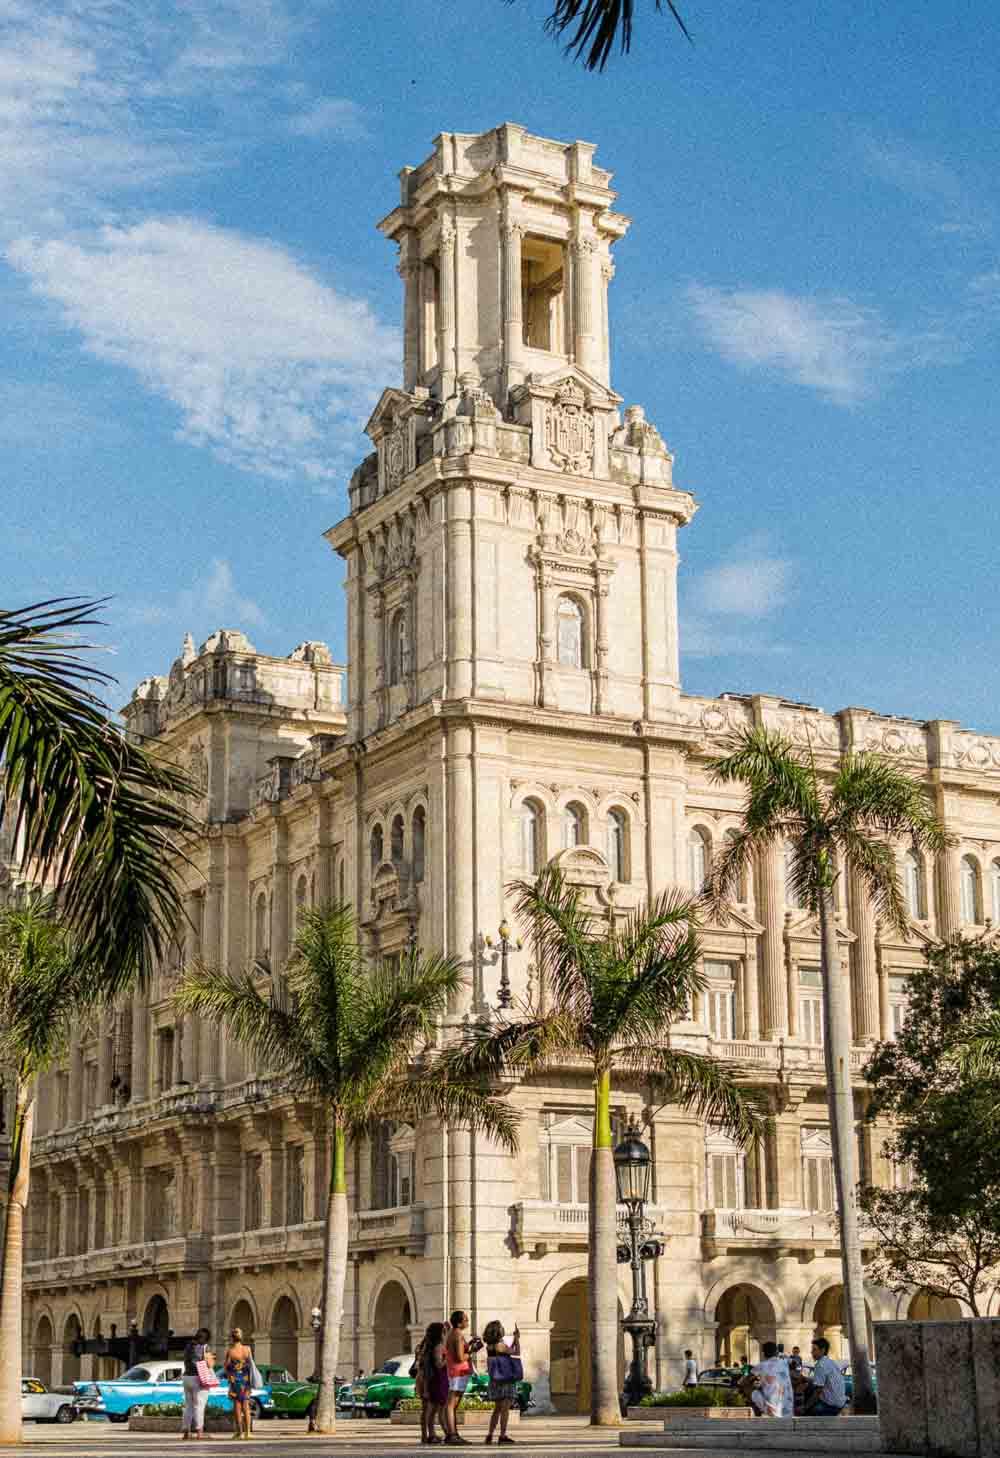 Historical Architecture in Havana Cuba